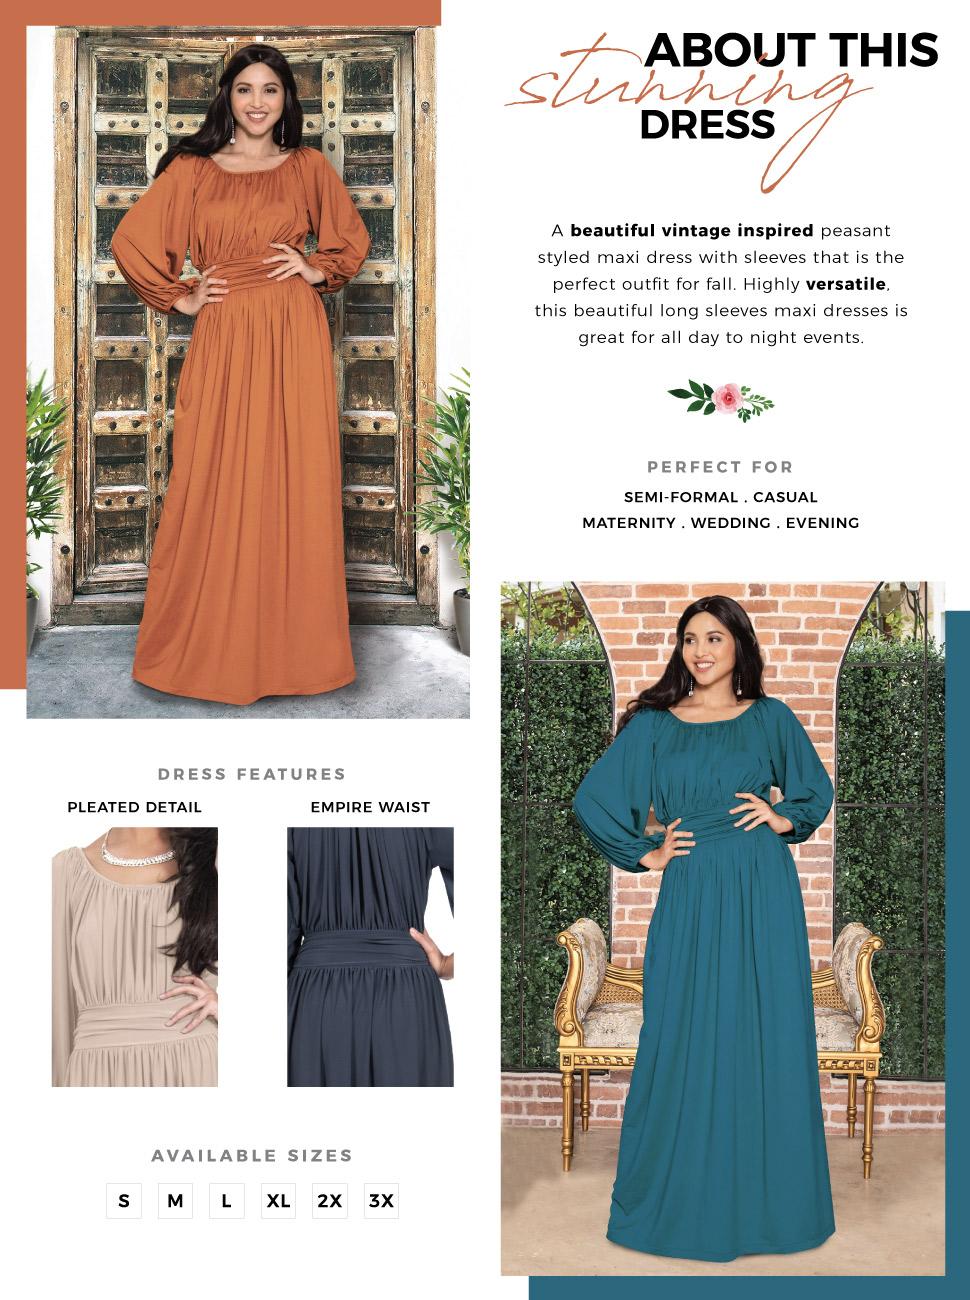 73cf505b7e09 Womens Sleeve Vintage Peasant Empire Waist Pleated Fall. womens ladies  elegant stunning maxi dress ...